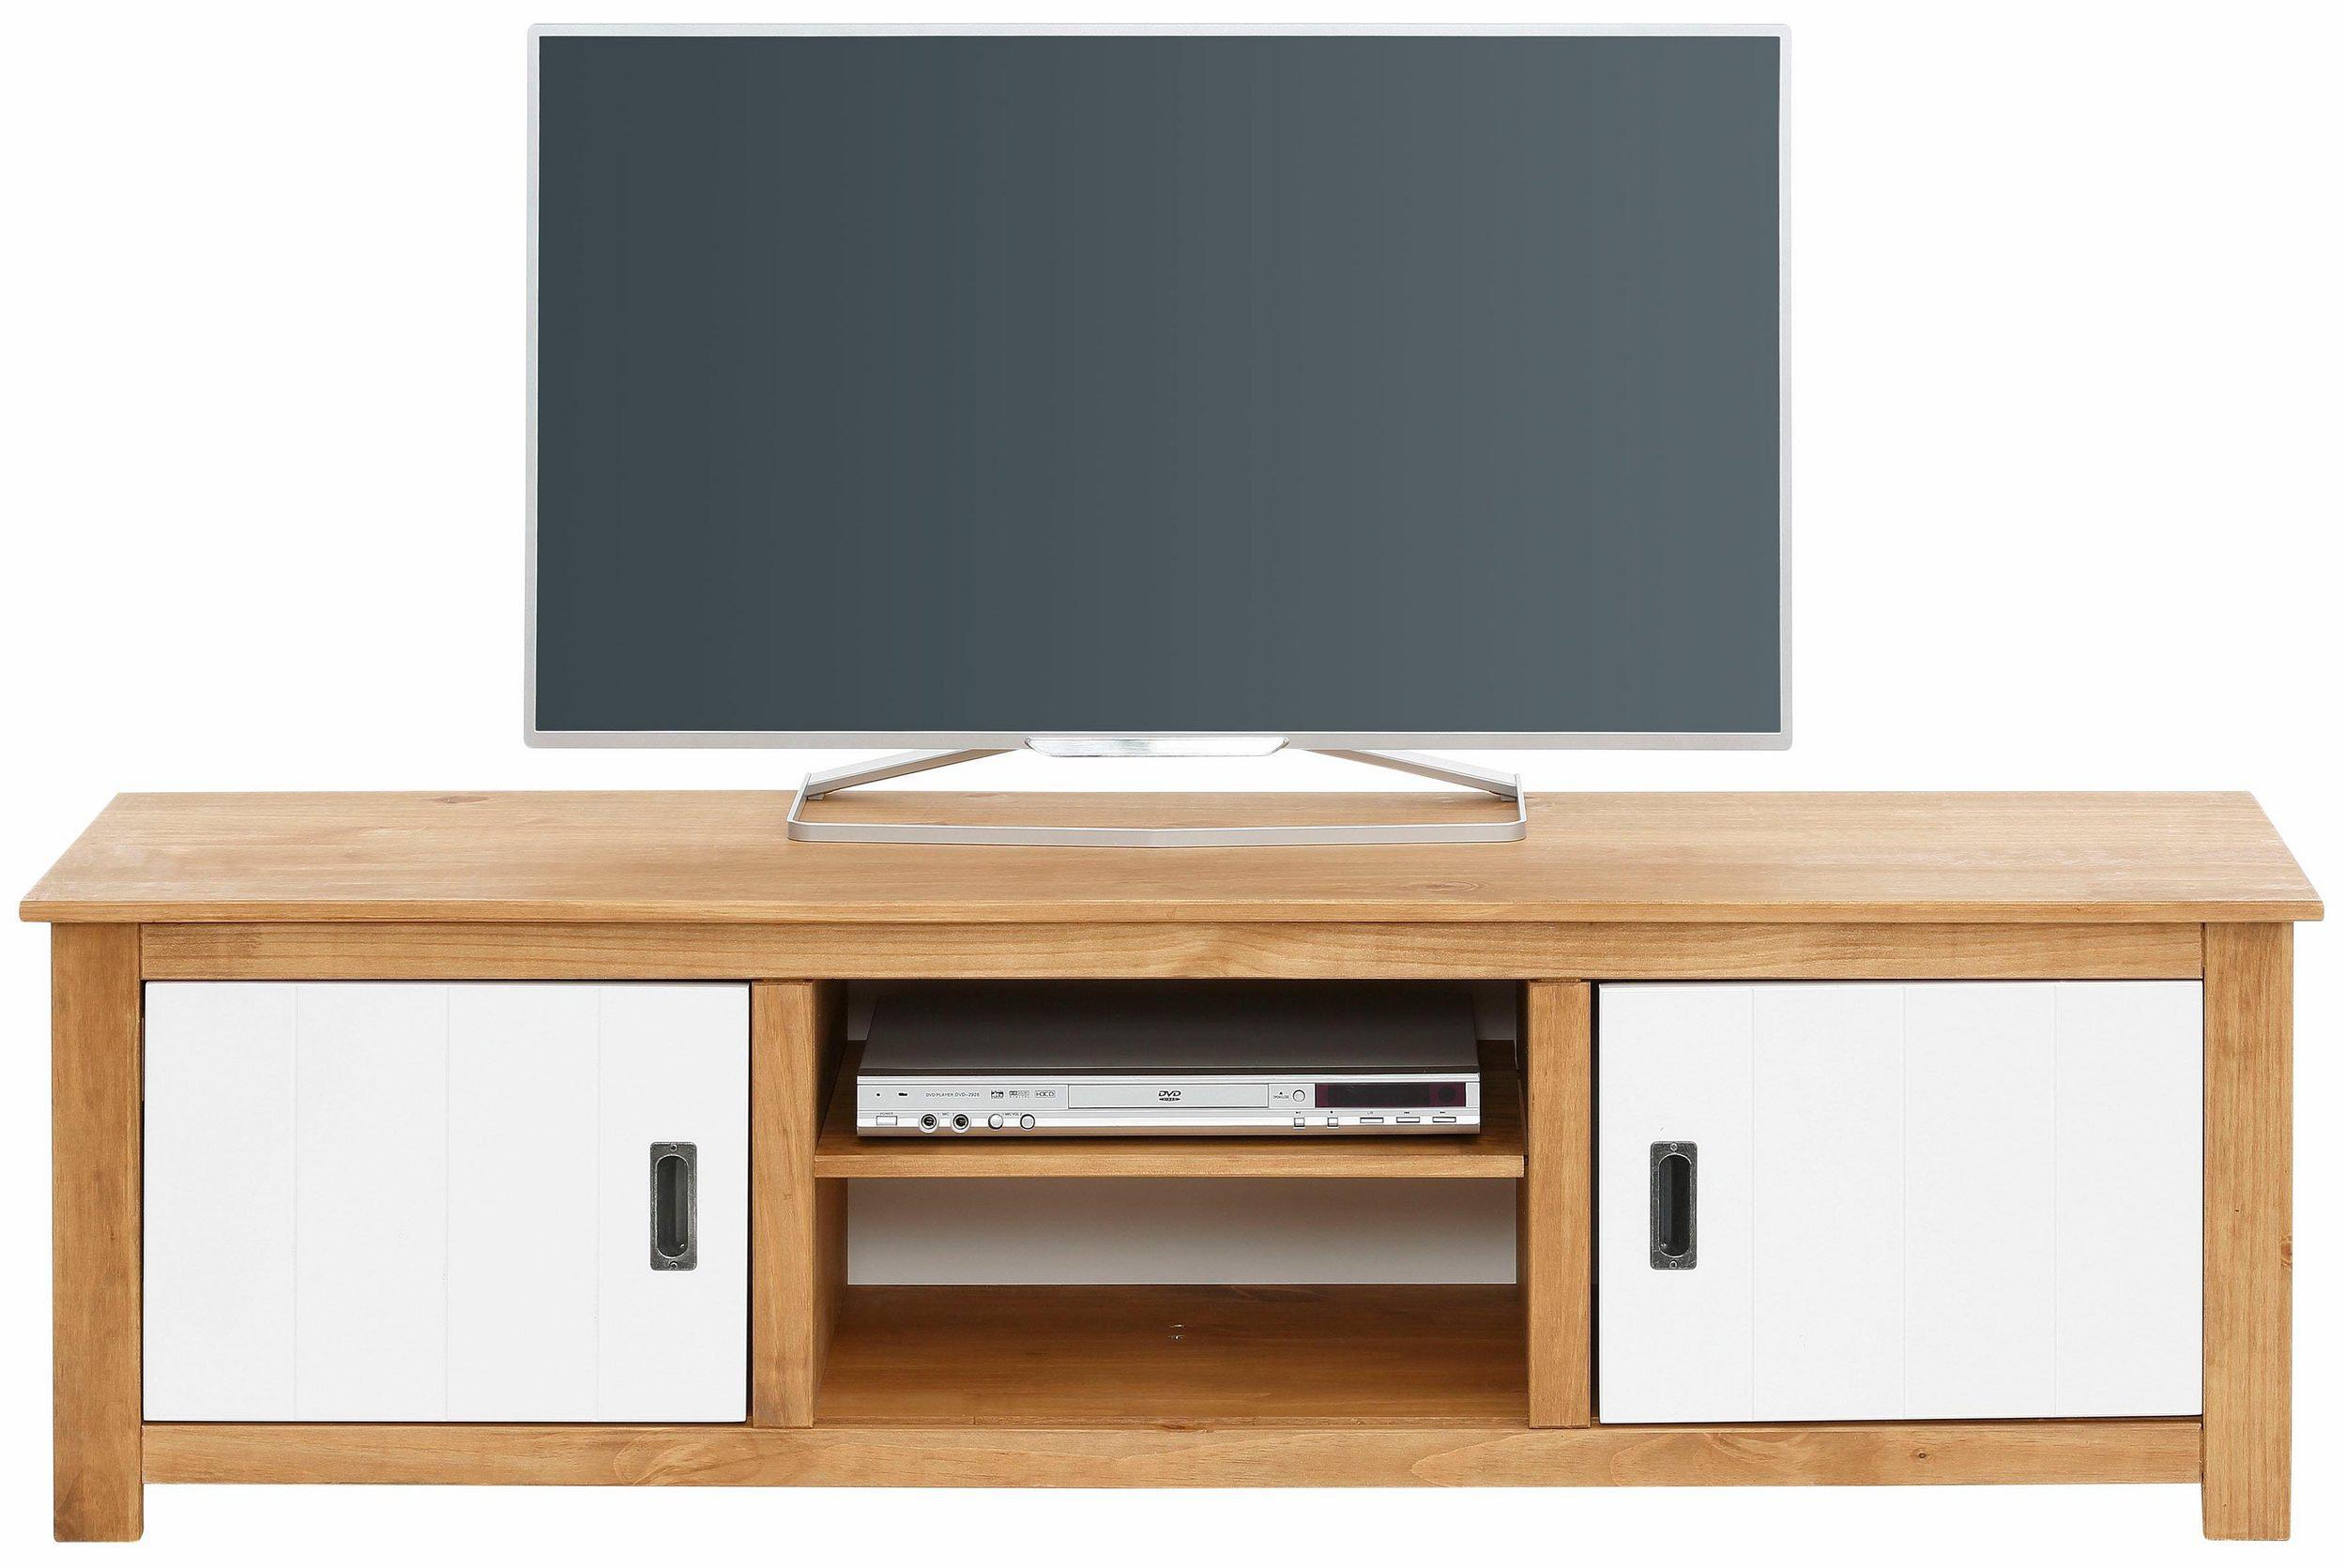 Gewaltig Lowboard Fernseher Beste Wahl